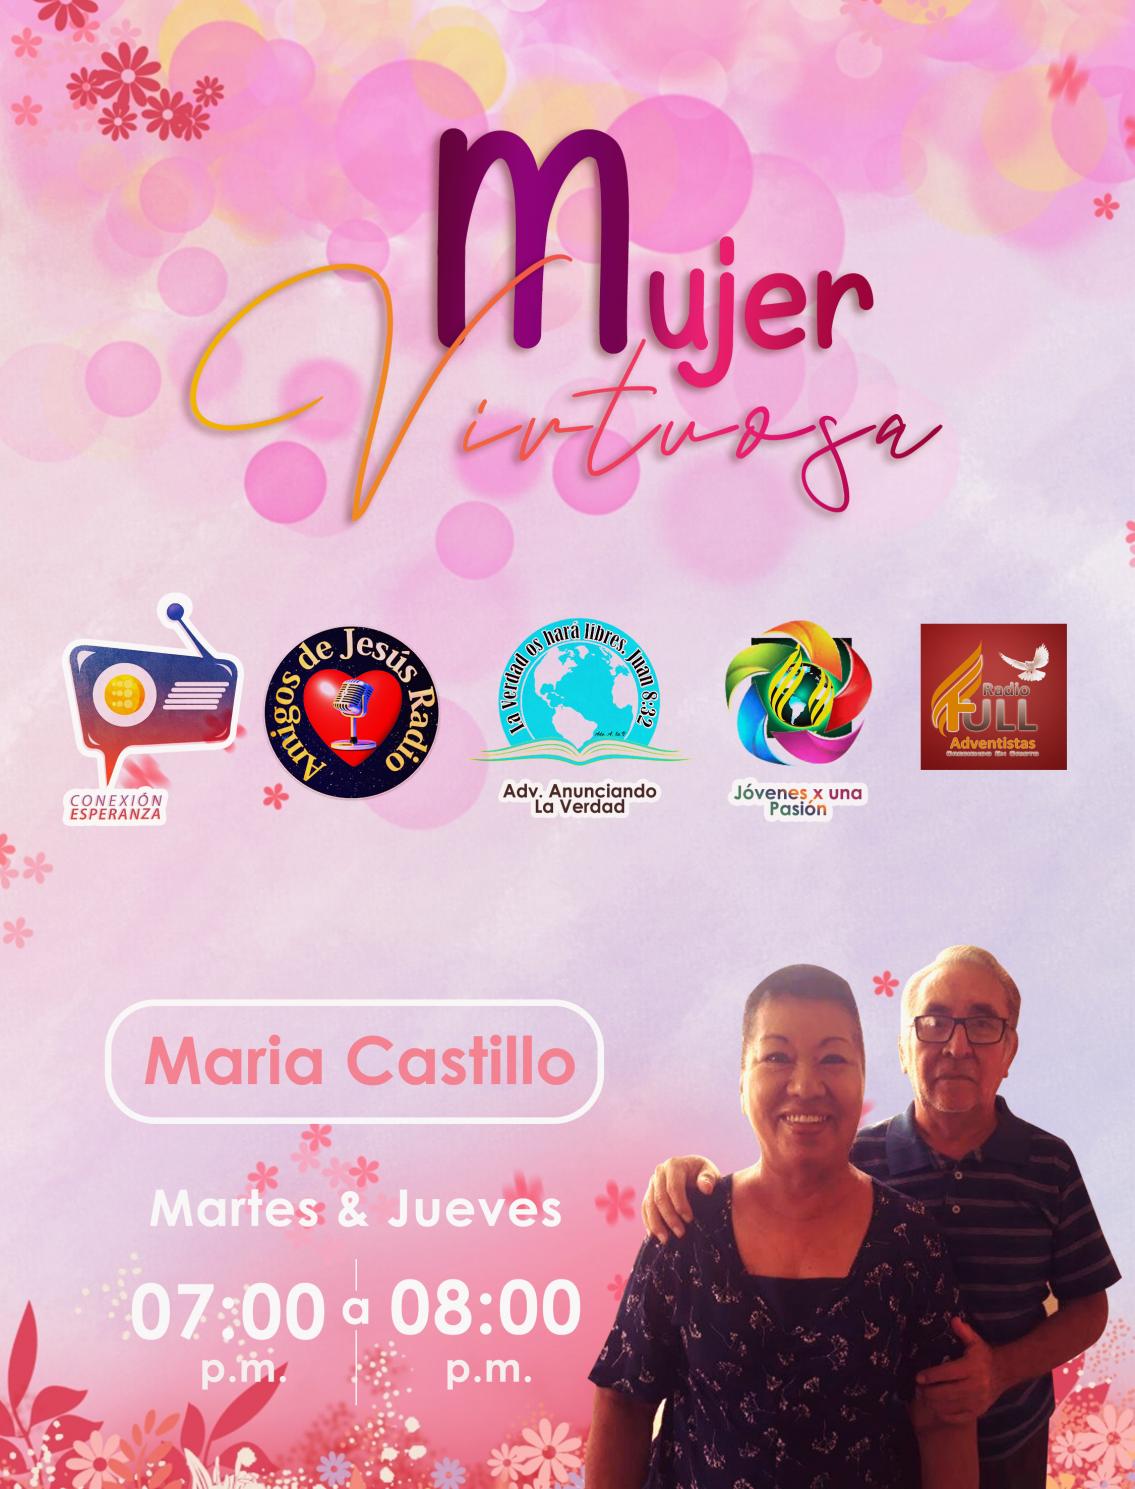 Maria Castillo2